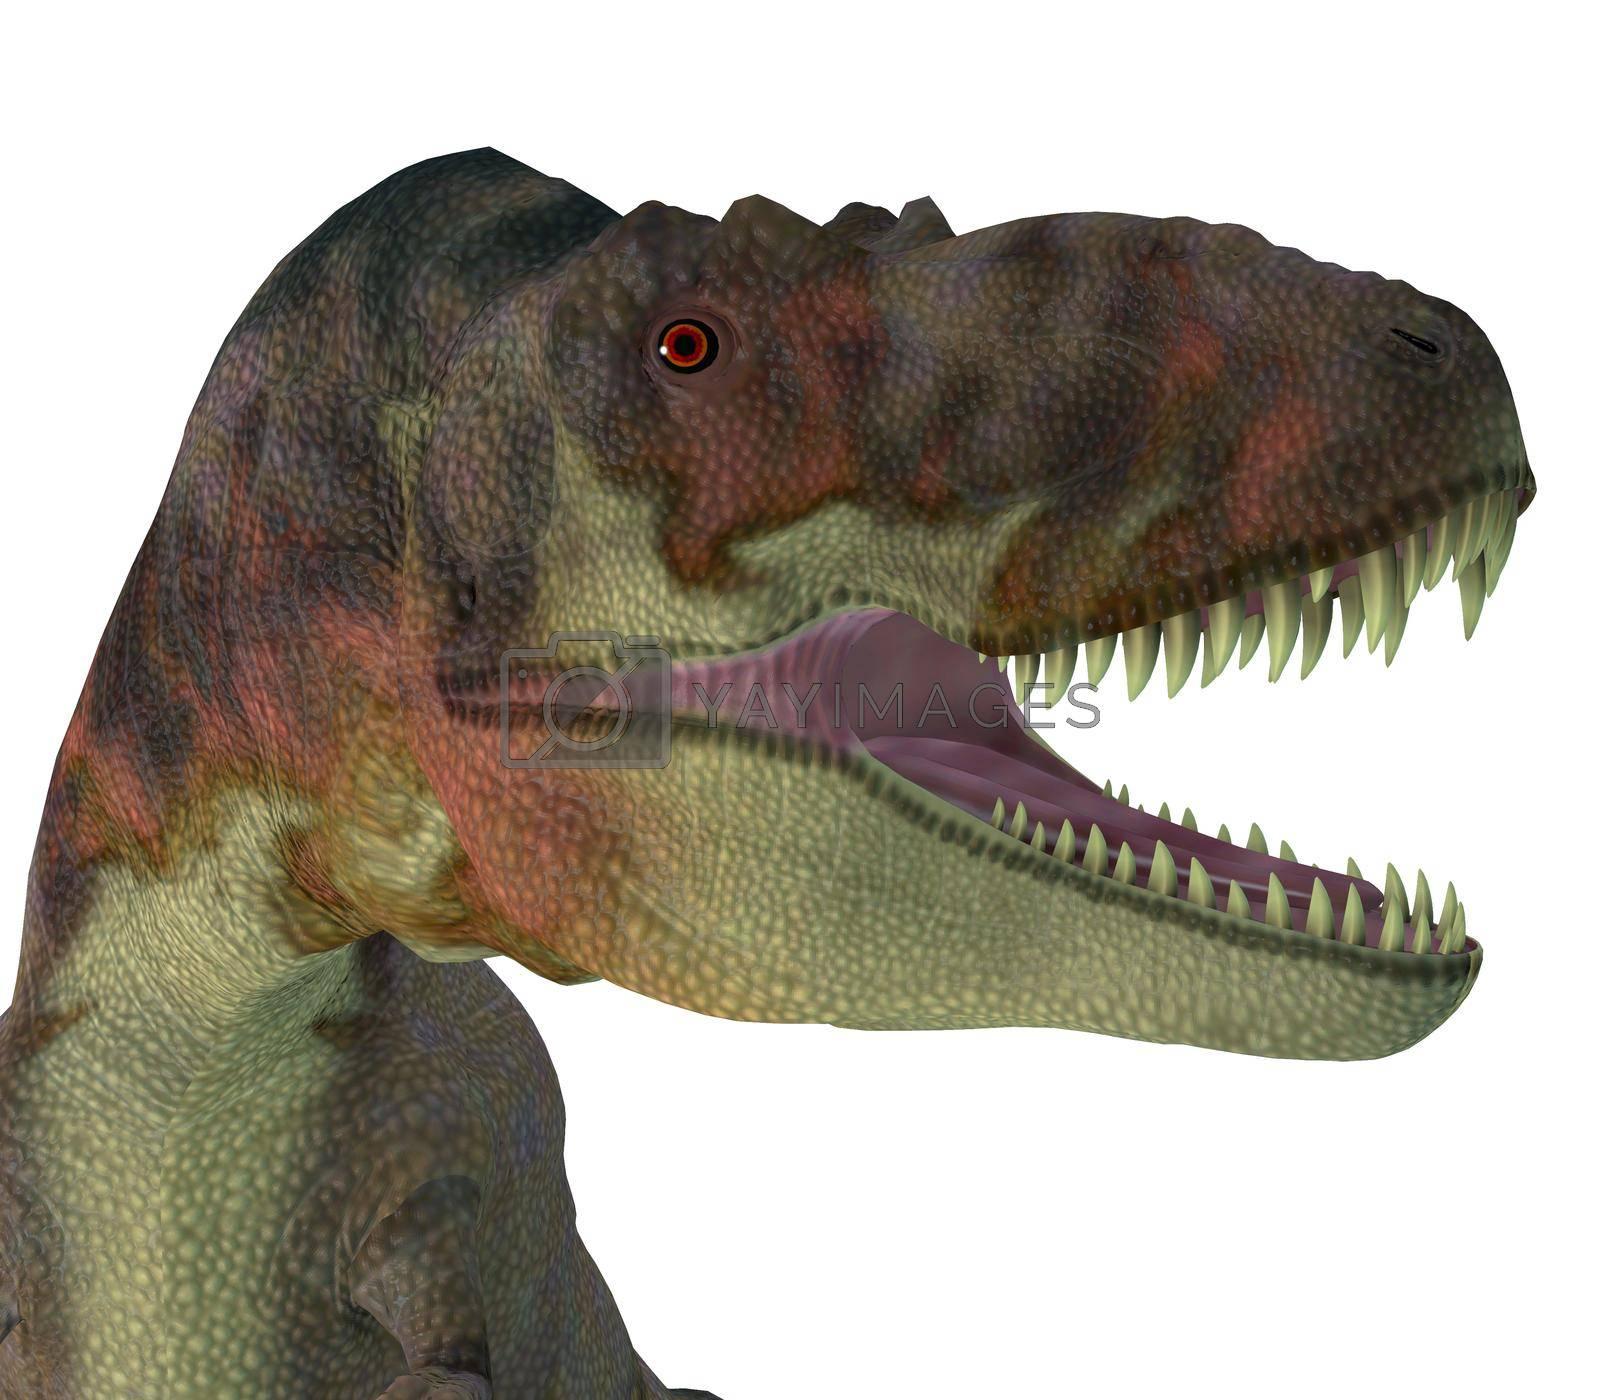 Royalty free image of Daspletosaurus Dinosaur Jaws by Catmando